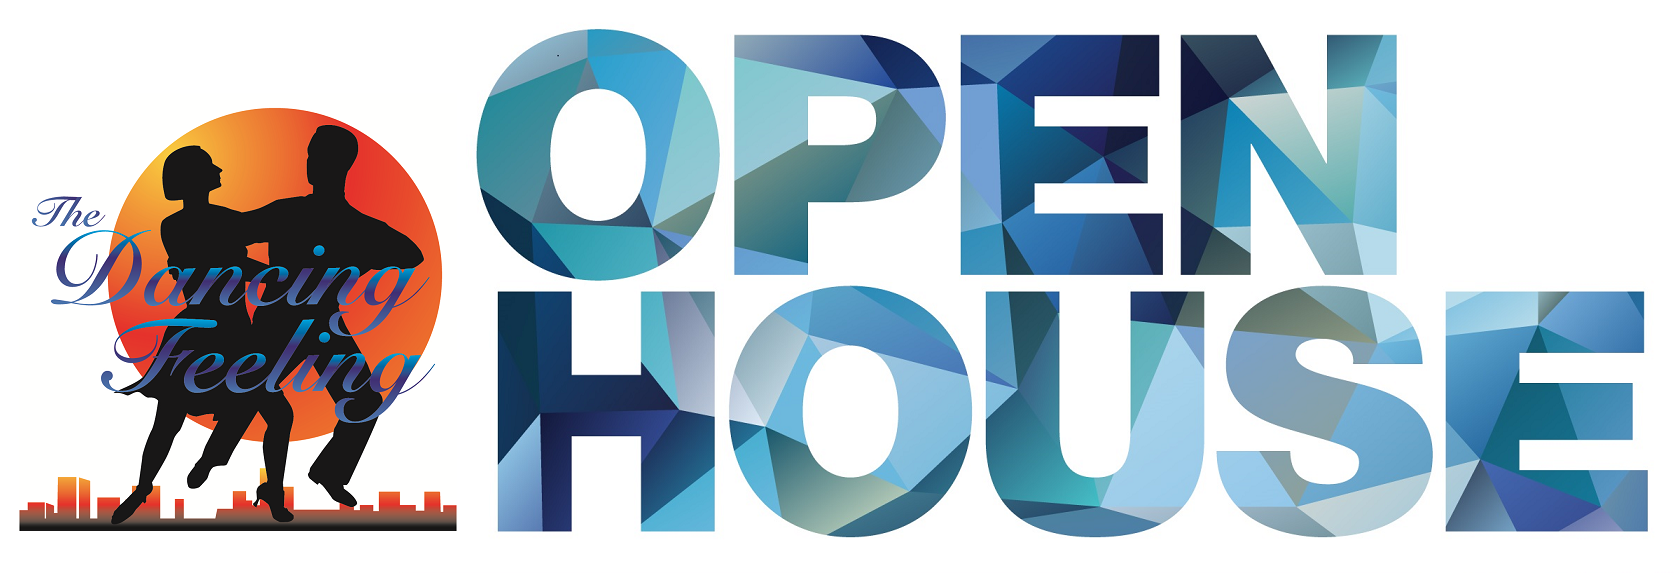 Open House, The Dancing Feeling